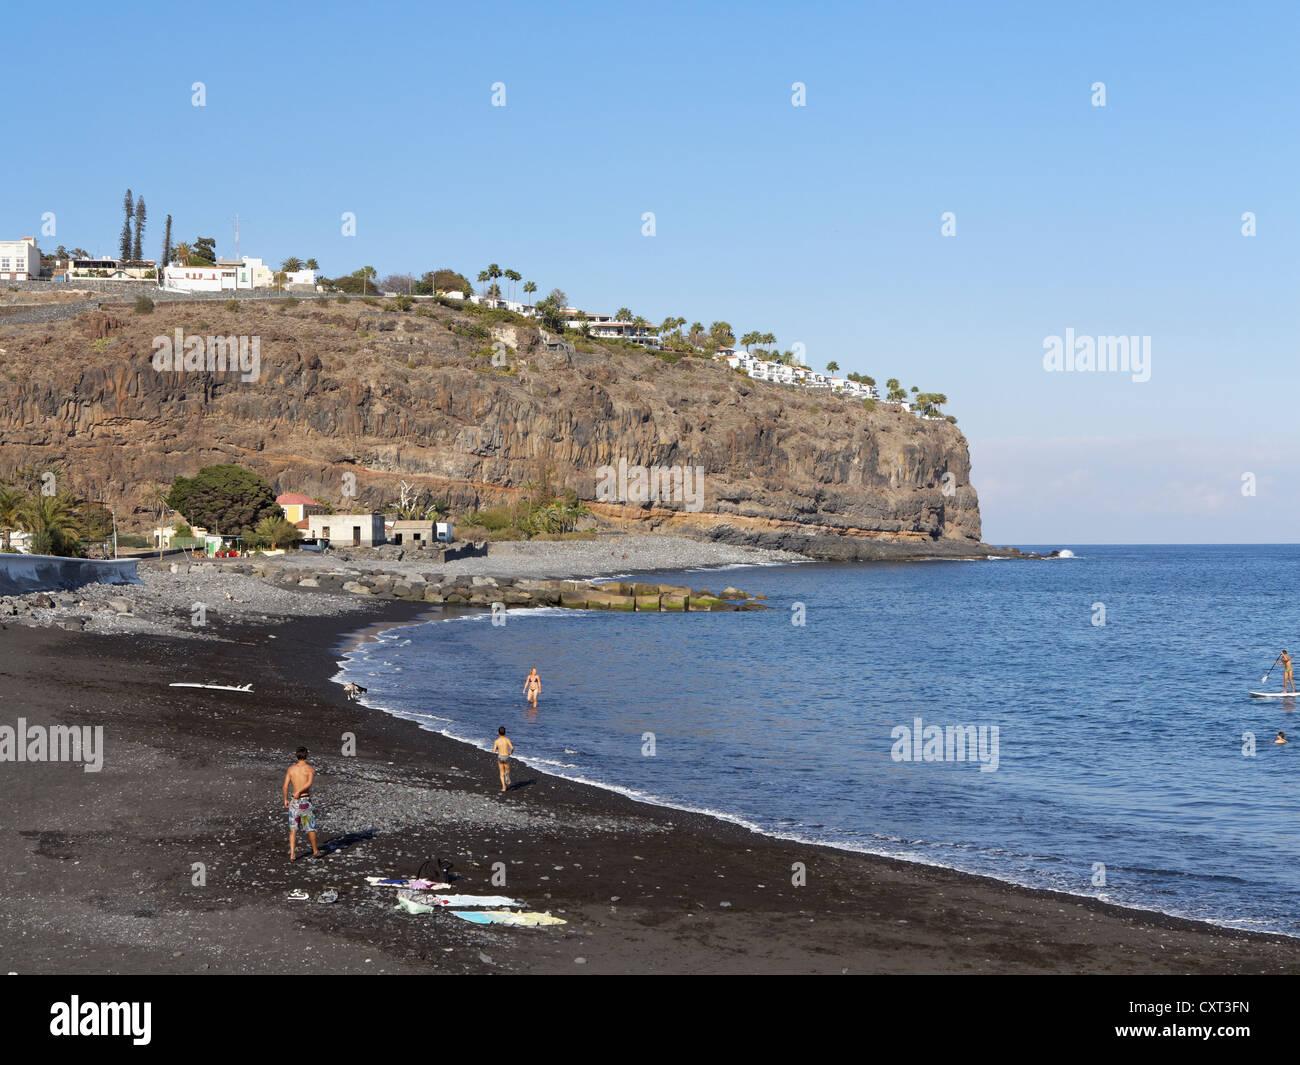 Beach With The Hotel Jardin Tecina On The Cliffs Playa De Santiago